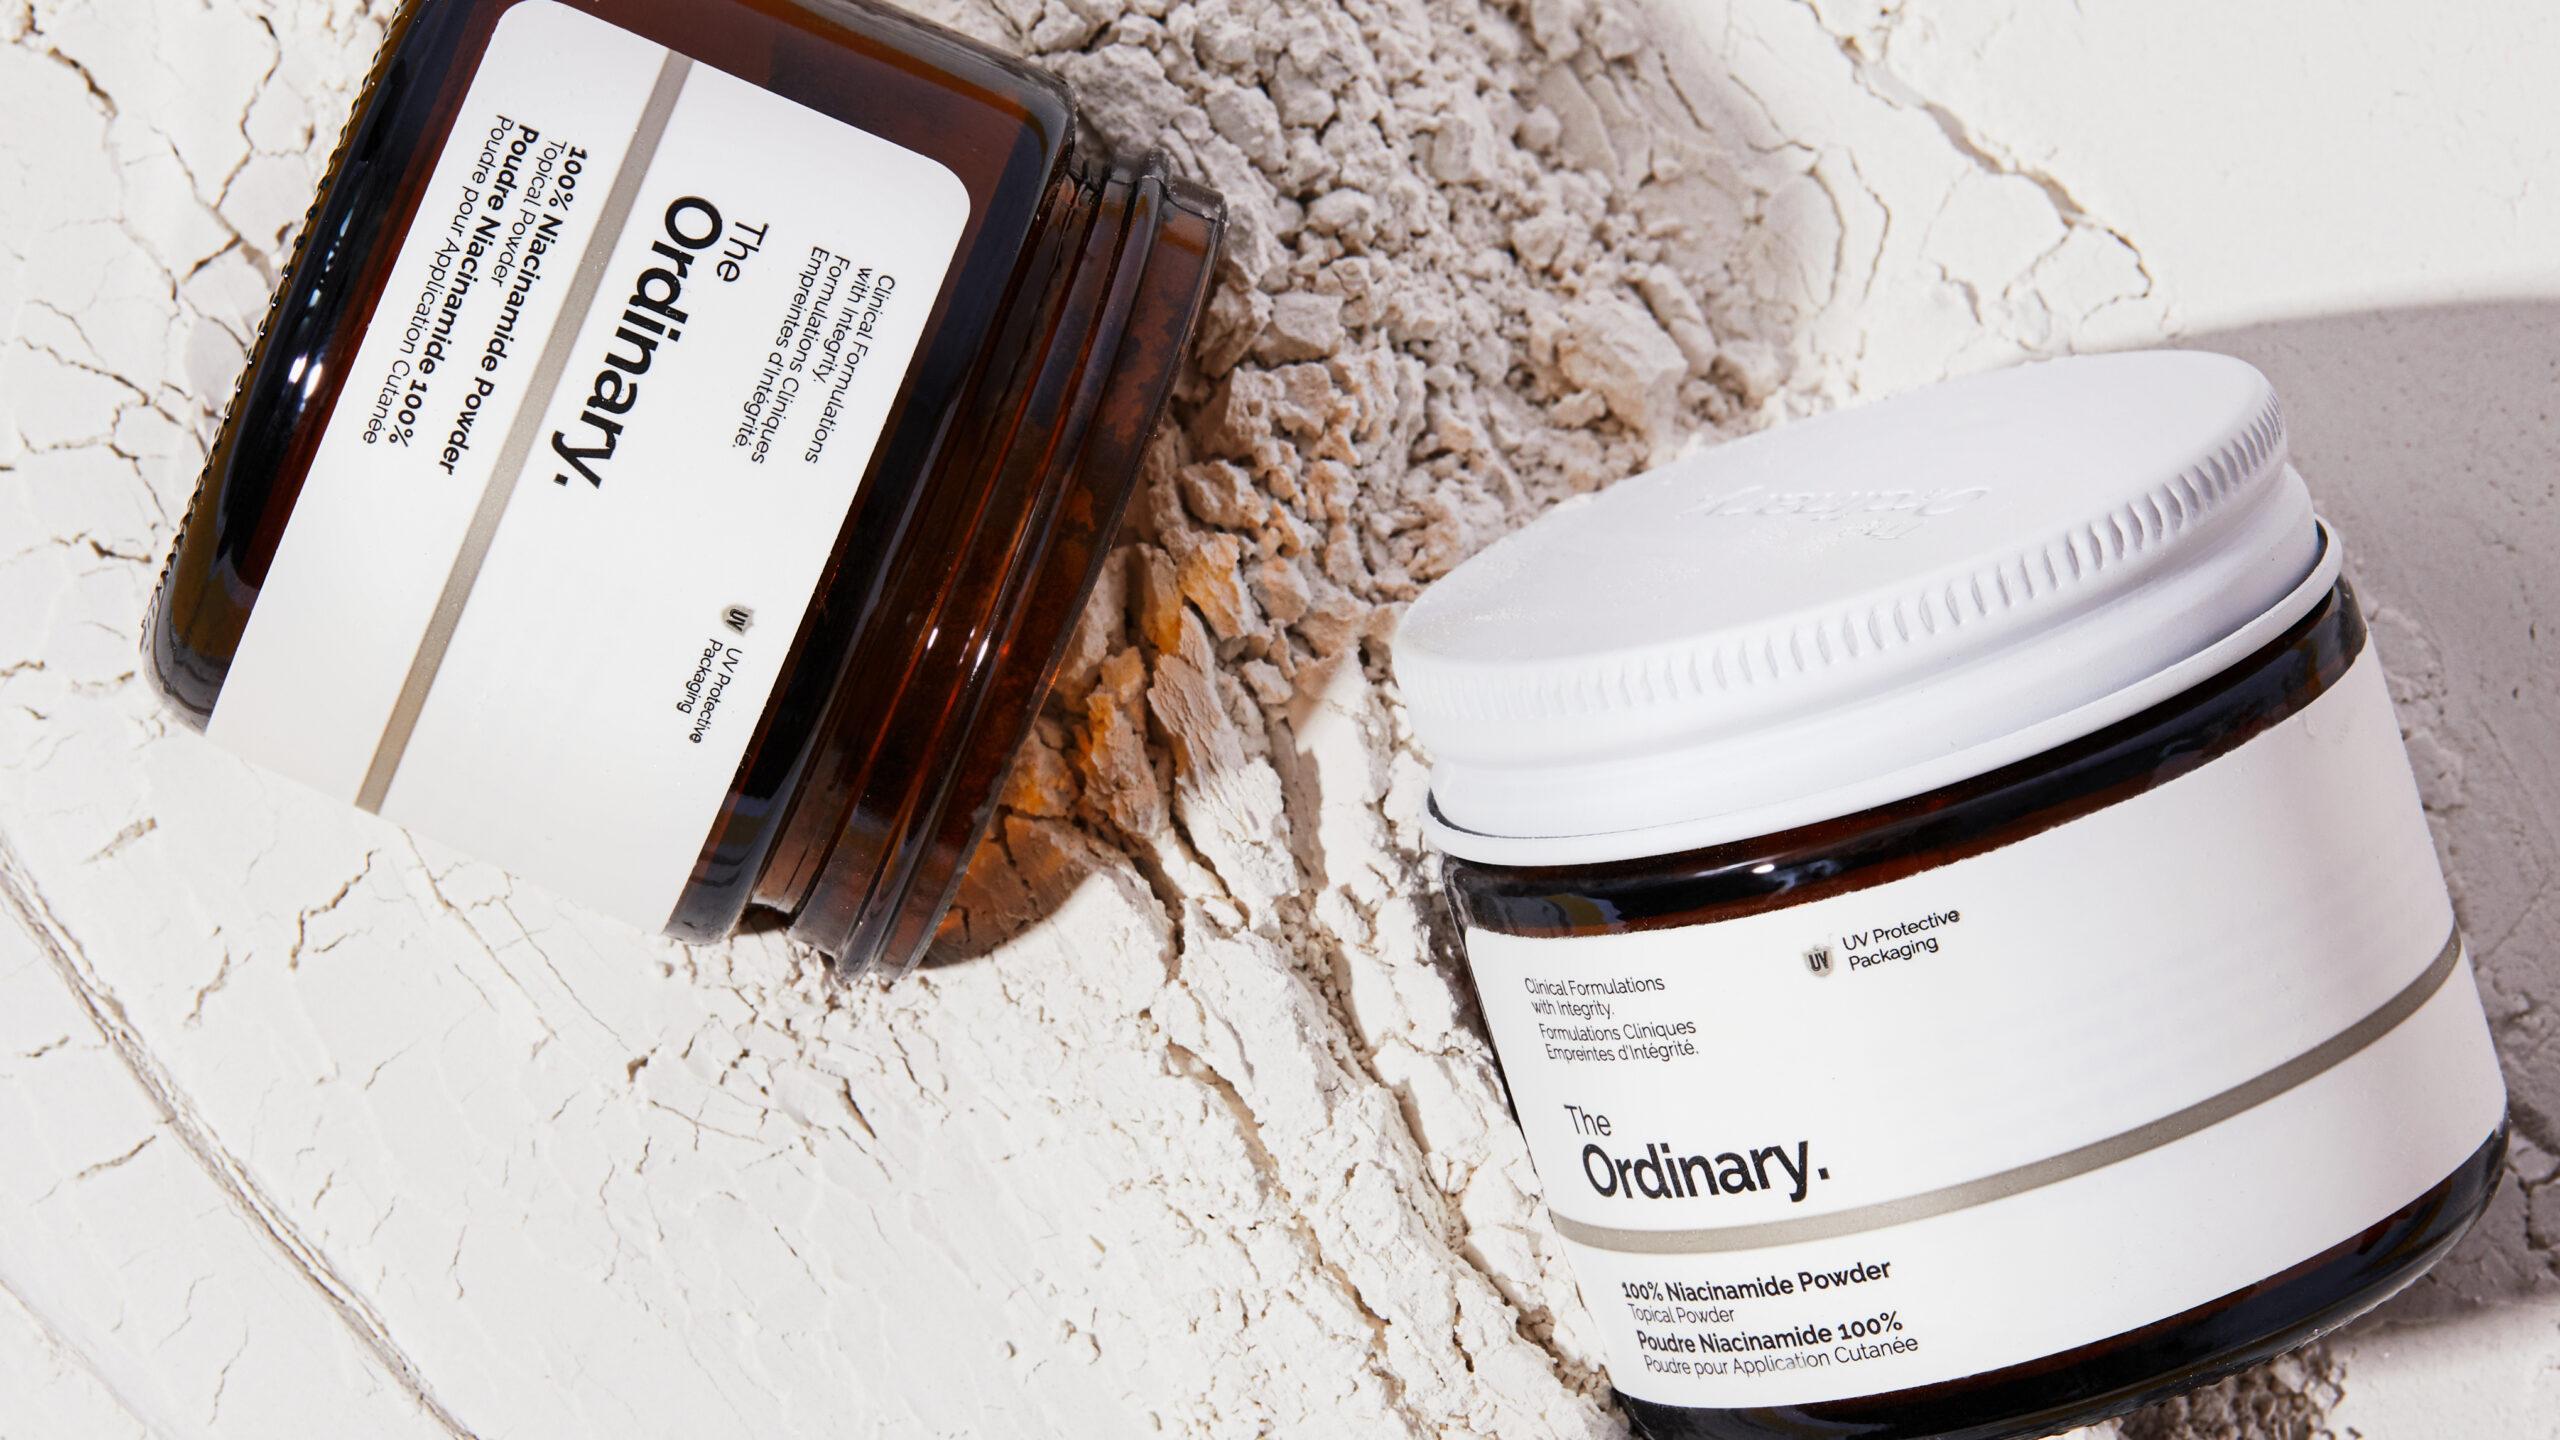 How To Use The Ordinary 100 Niacinamide Powder Beauty Bay Edited